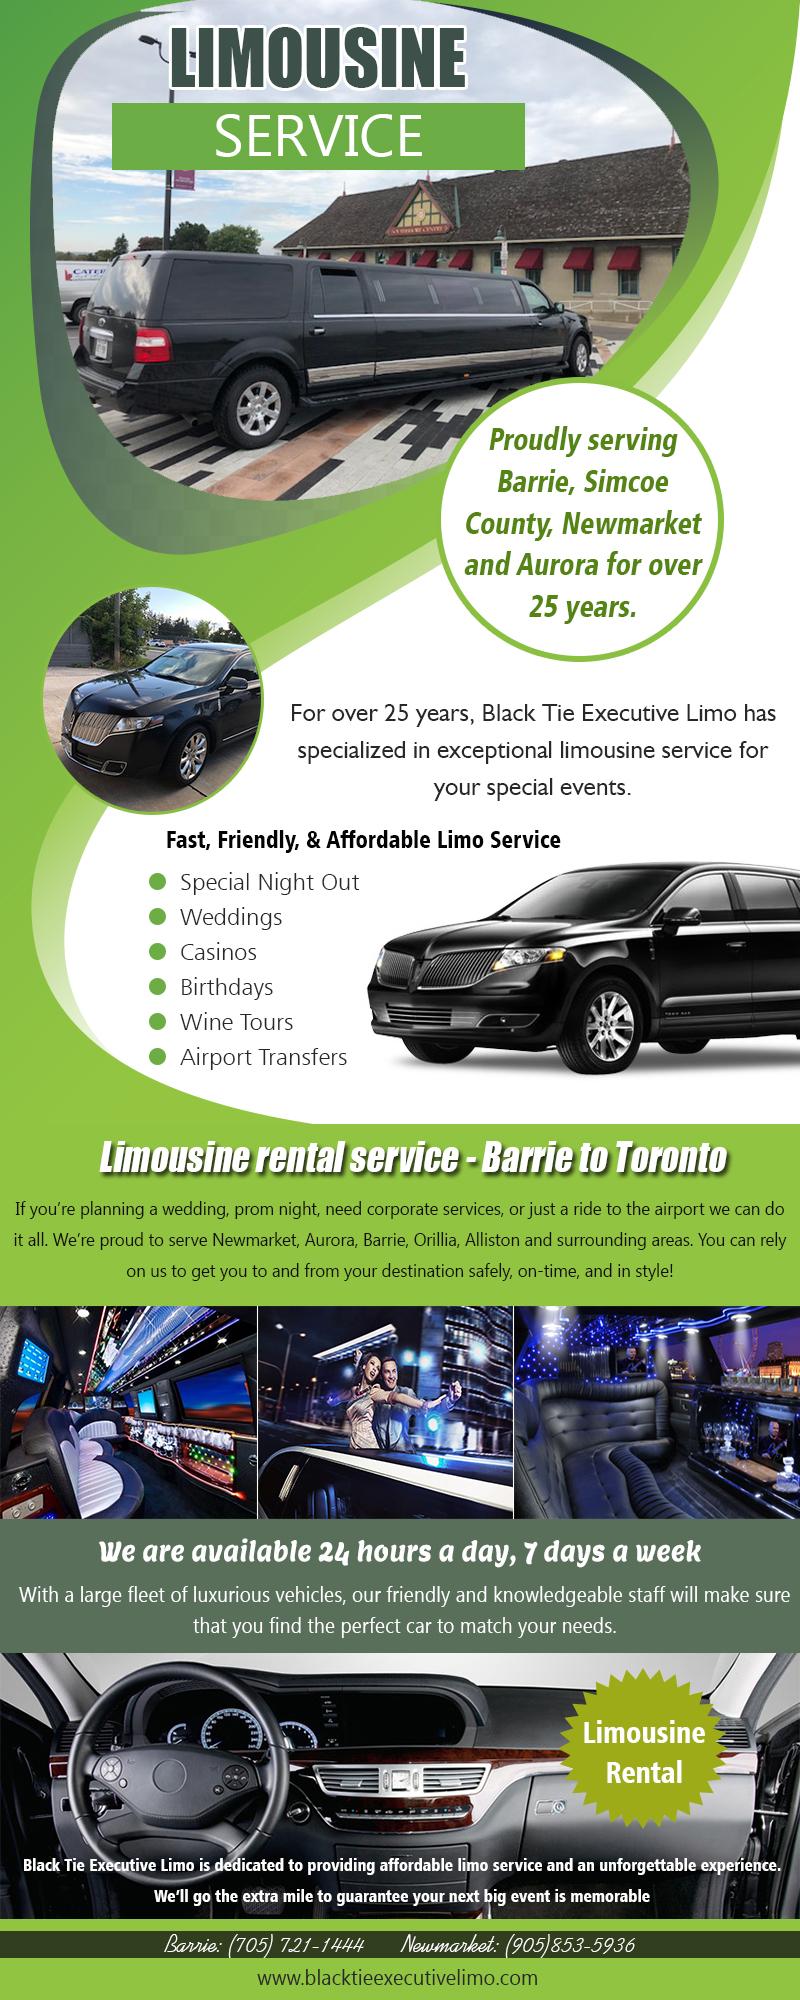 Limo Service   Call – 705-721-1444   blacktieexecutivelimo.com